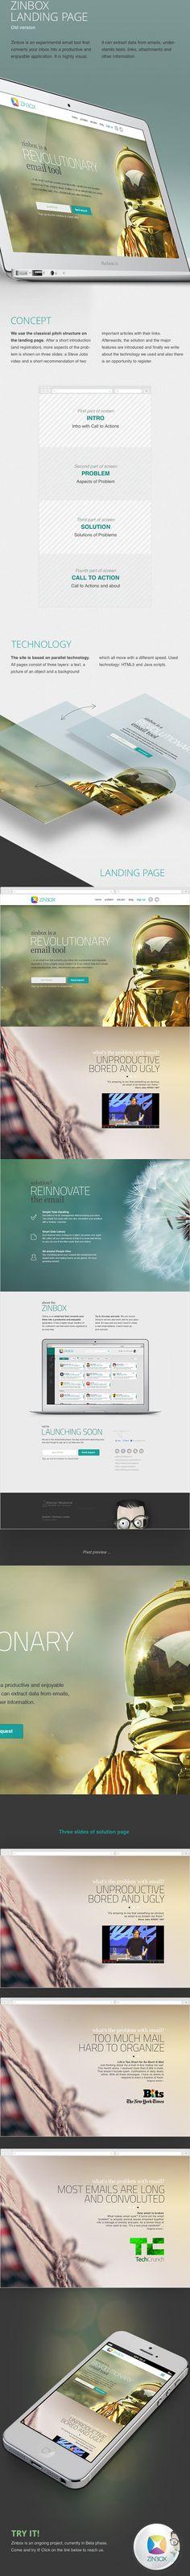 Zinbox landing page v1.1